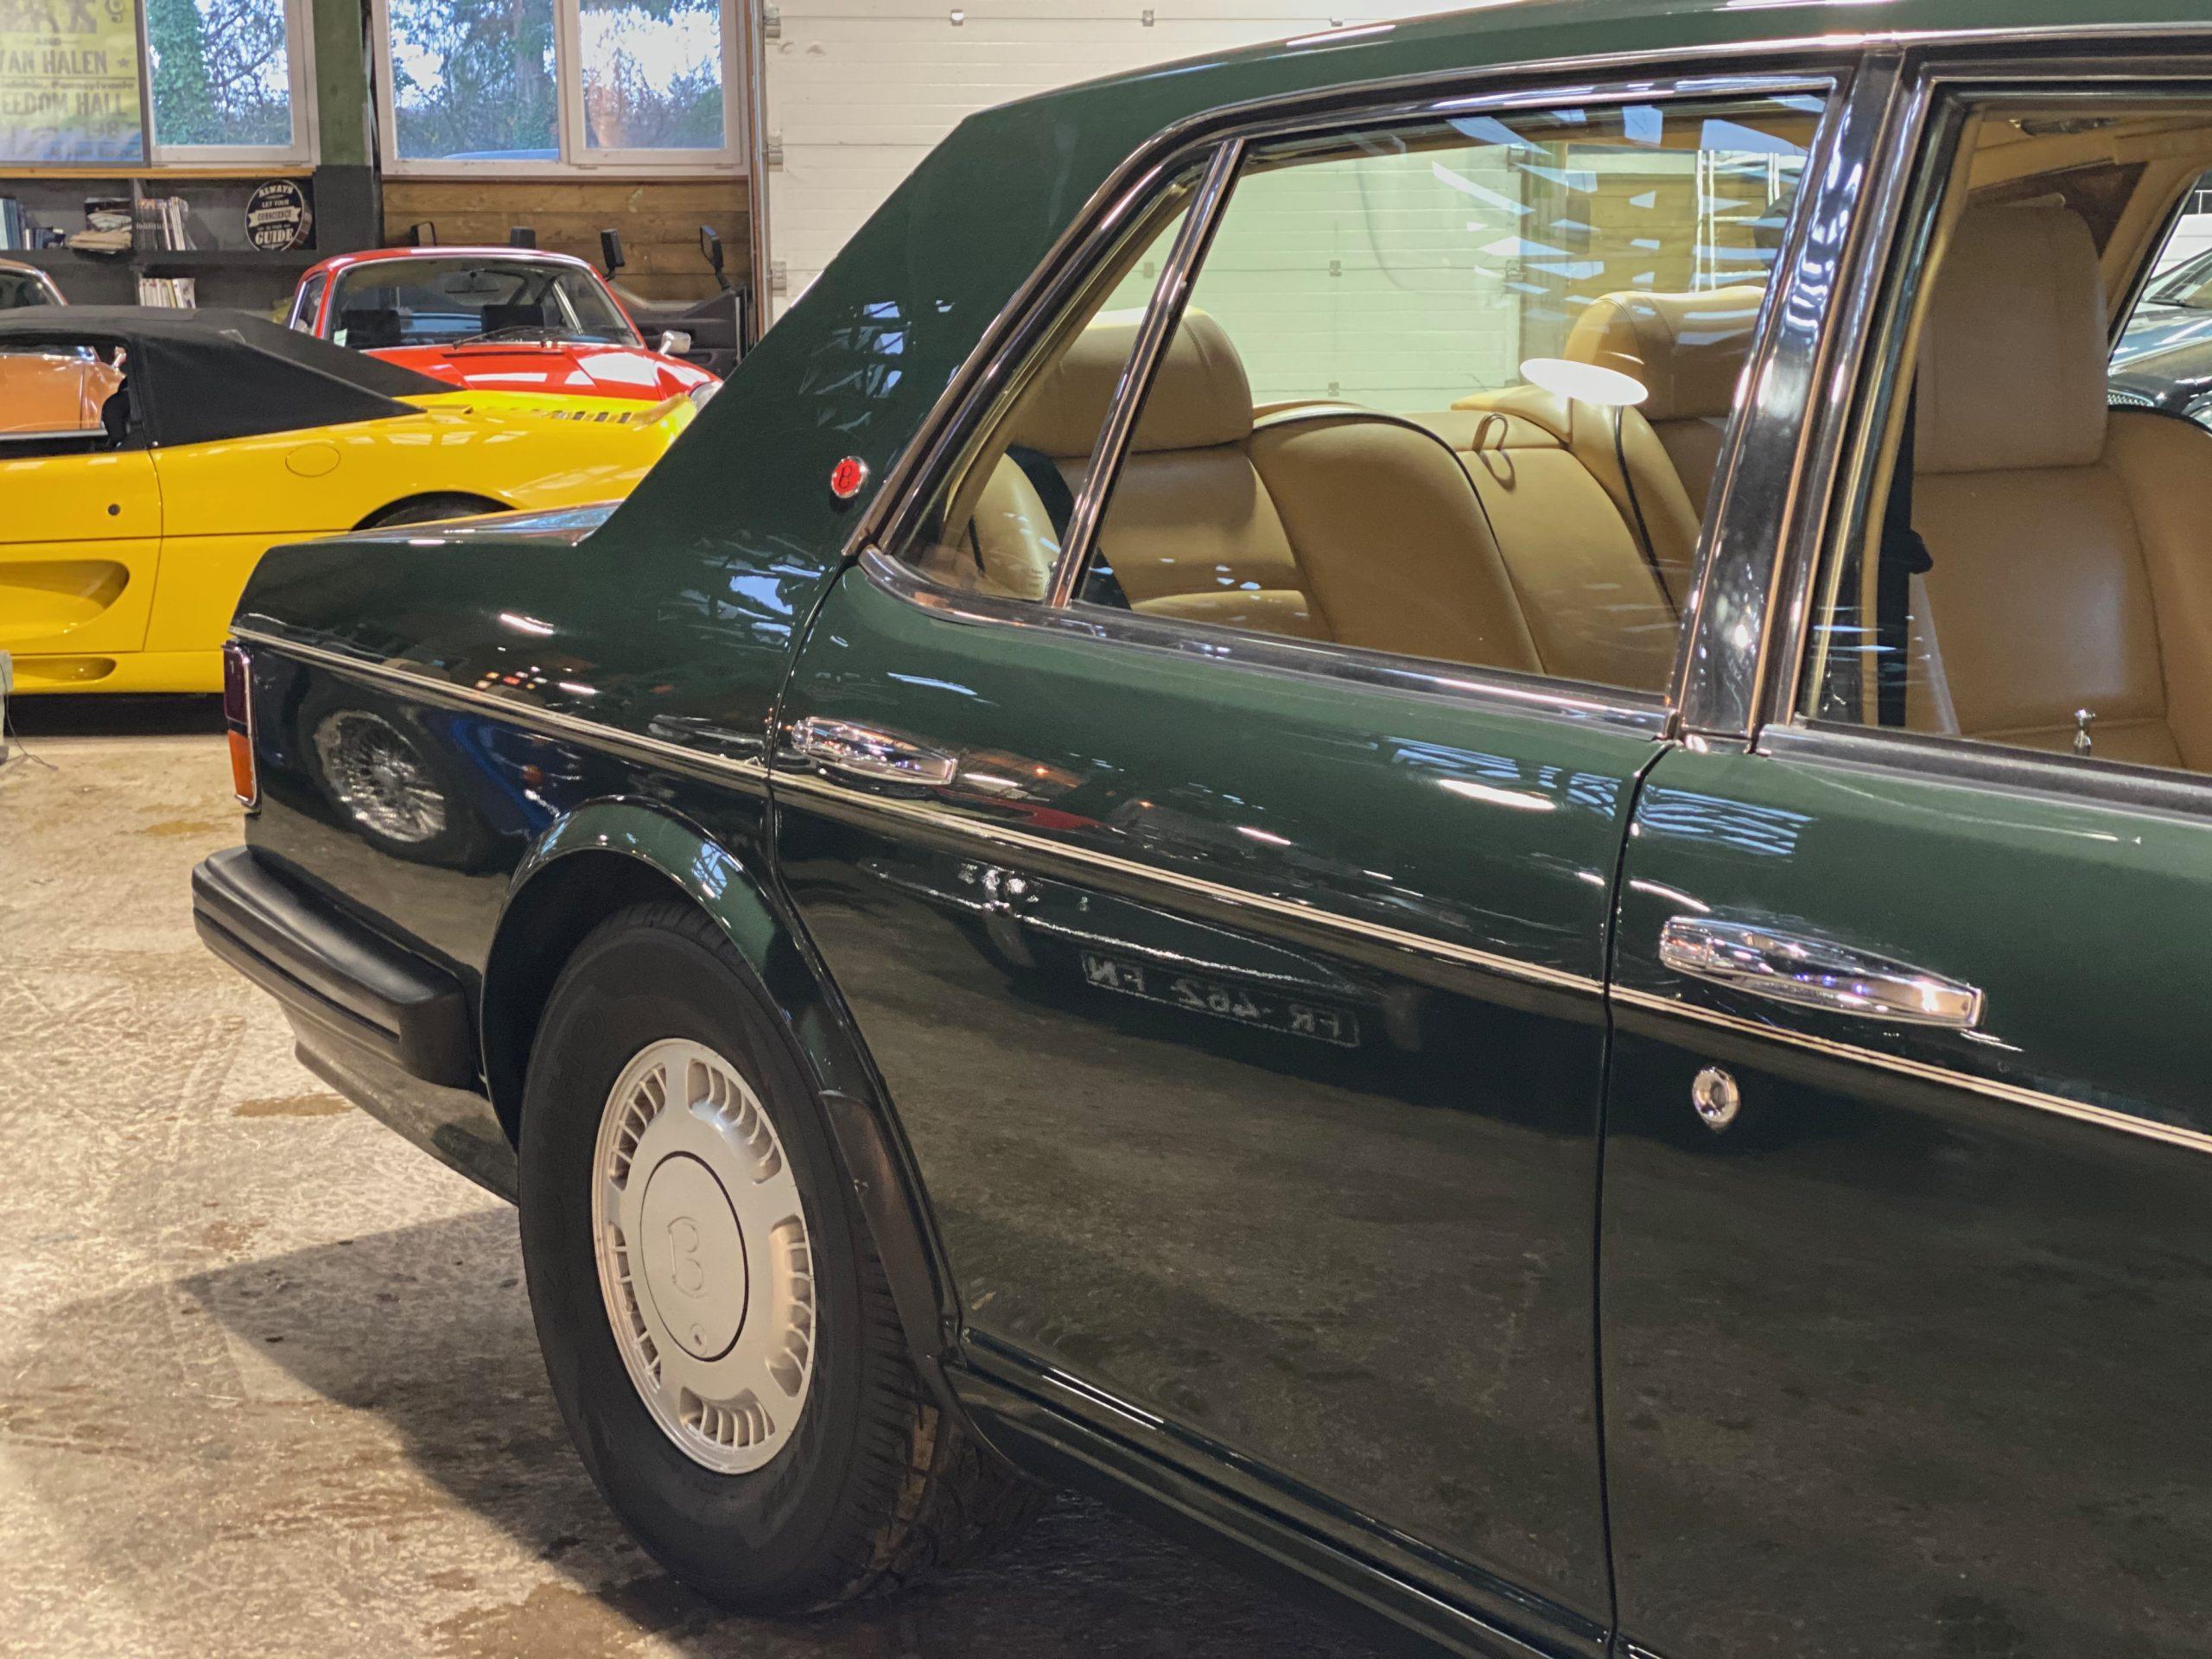 Bentley Turbo R